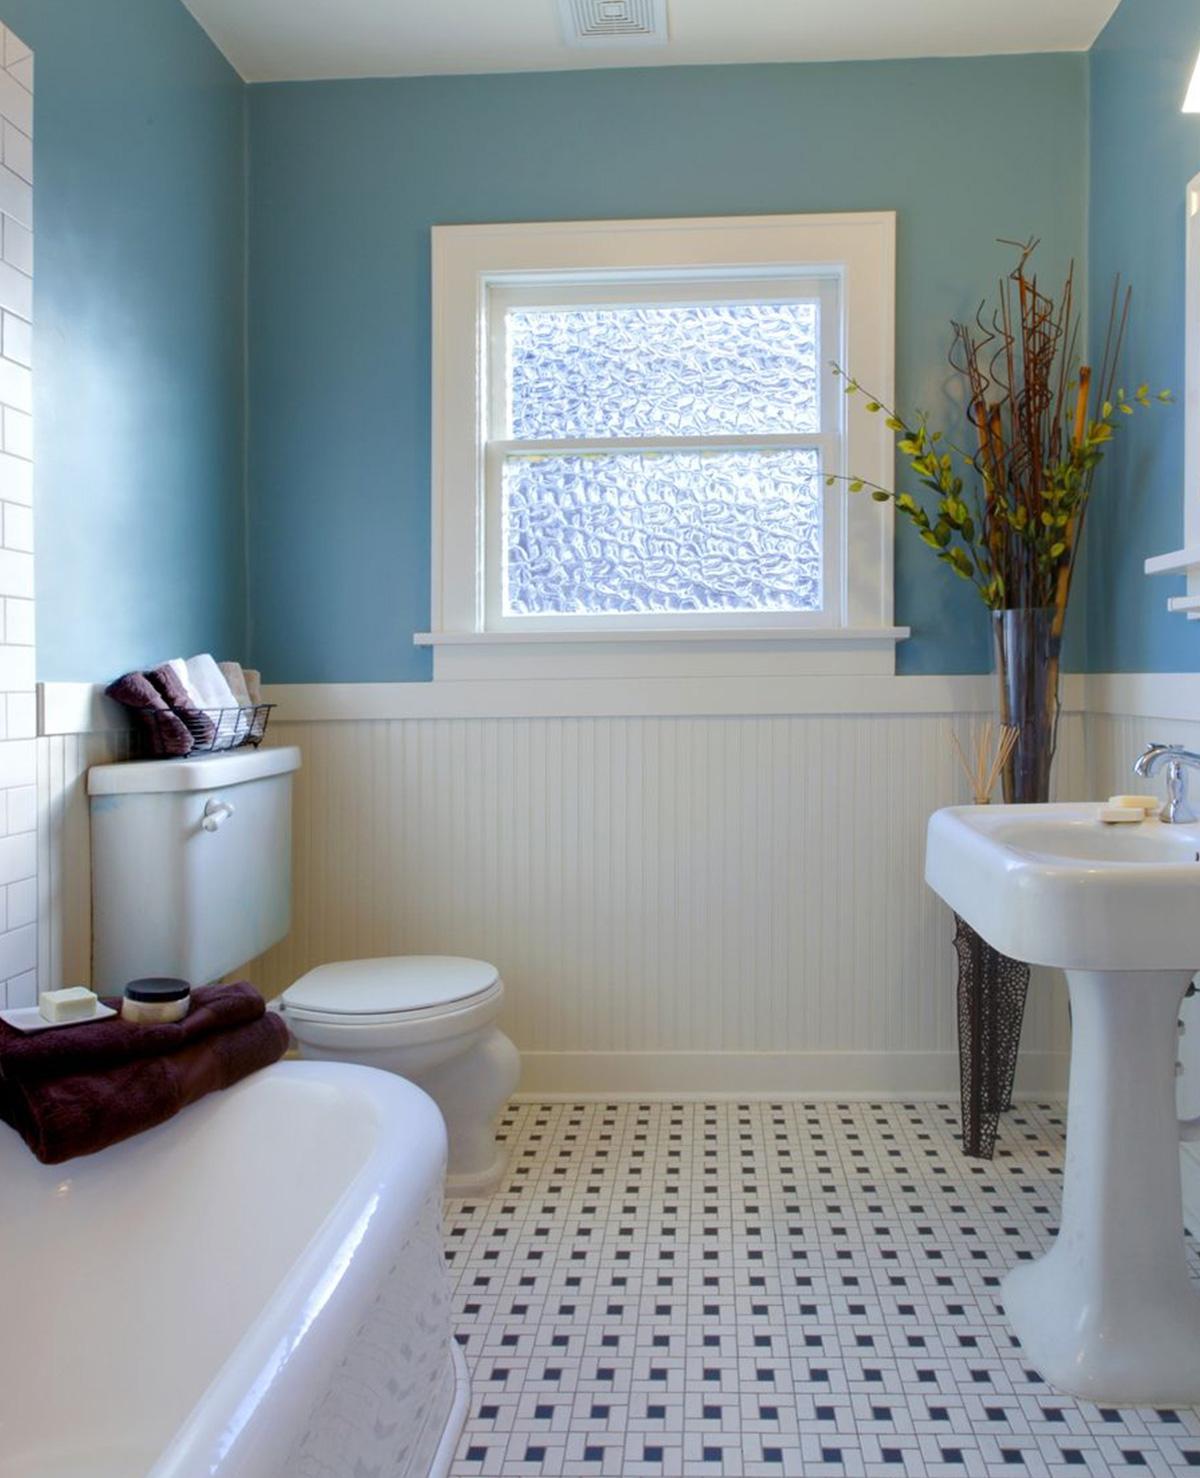 Dieuwke blogt week 3: badkamer en wasruimte opruimen